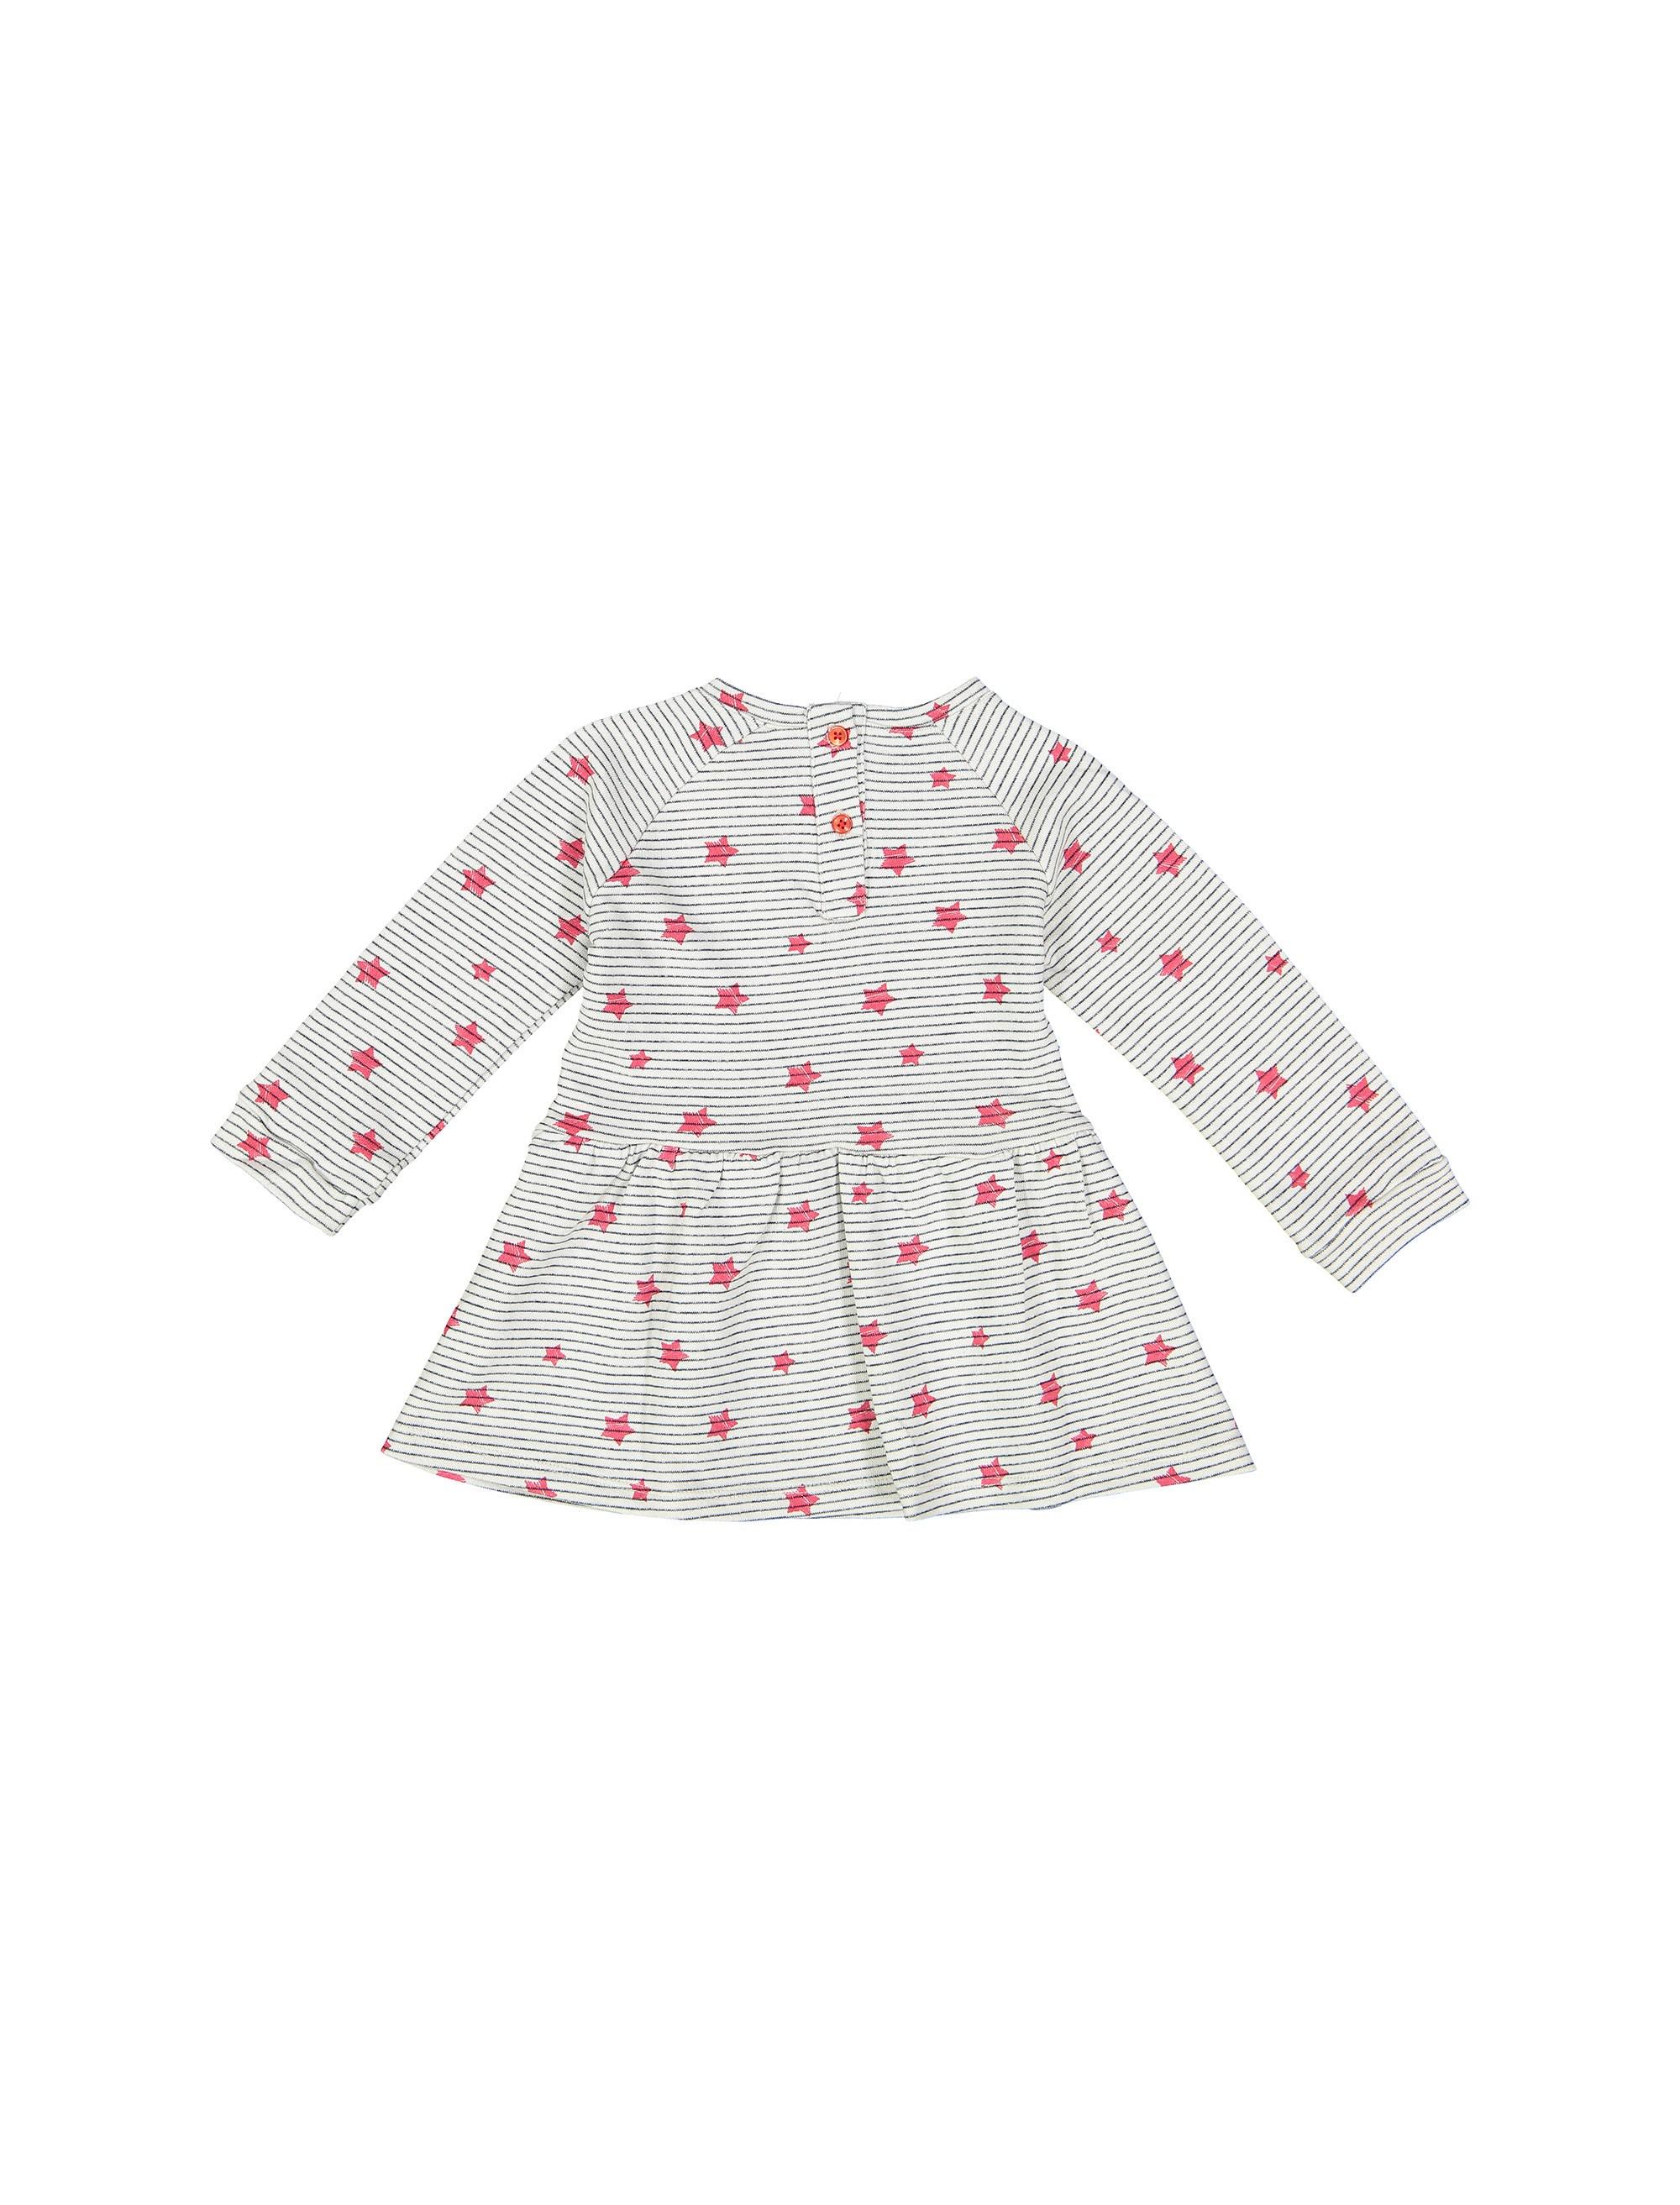 پیراهن نخی نوزادی دخترانه - کوتون - طوسي - 2